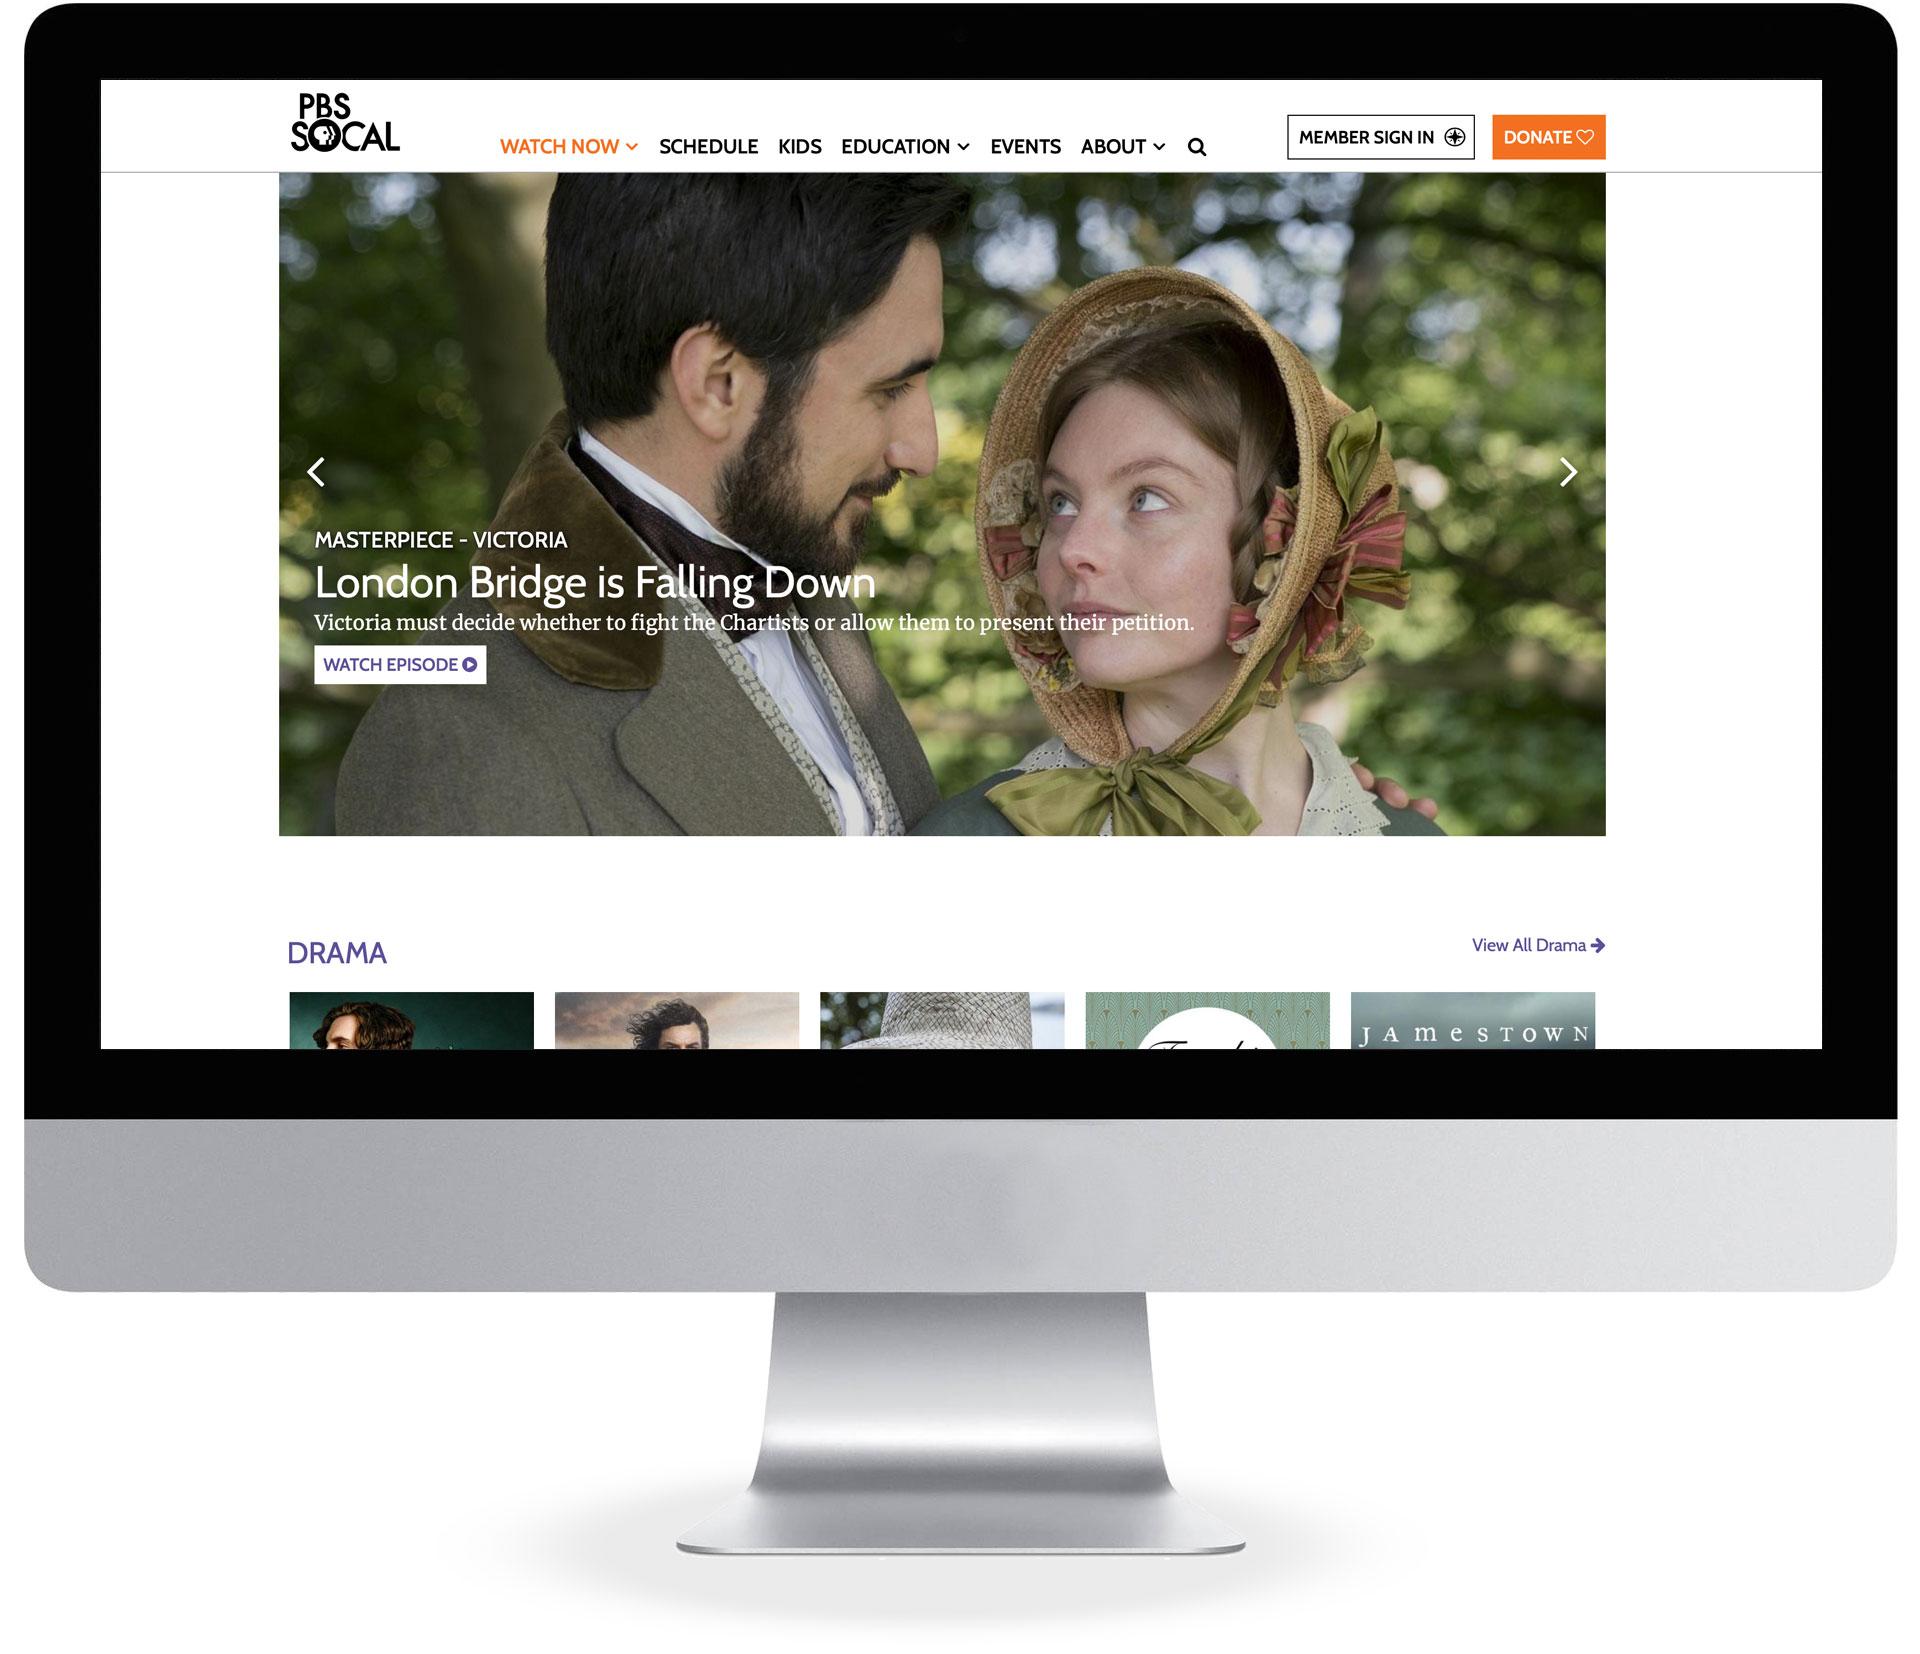 Desktop PBS Video Player on pbssocal.org